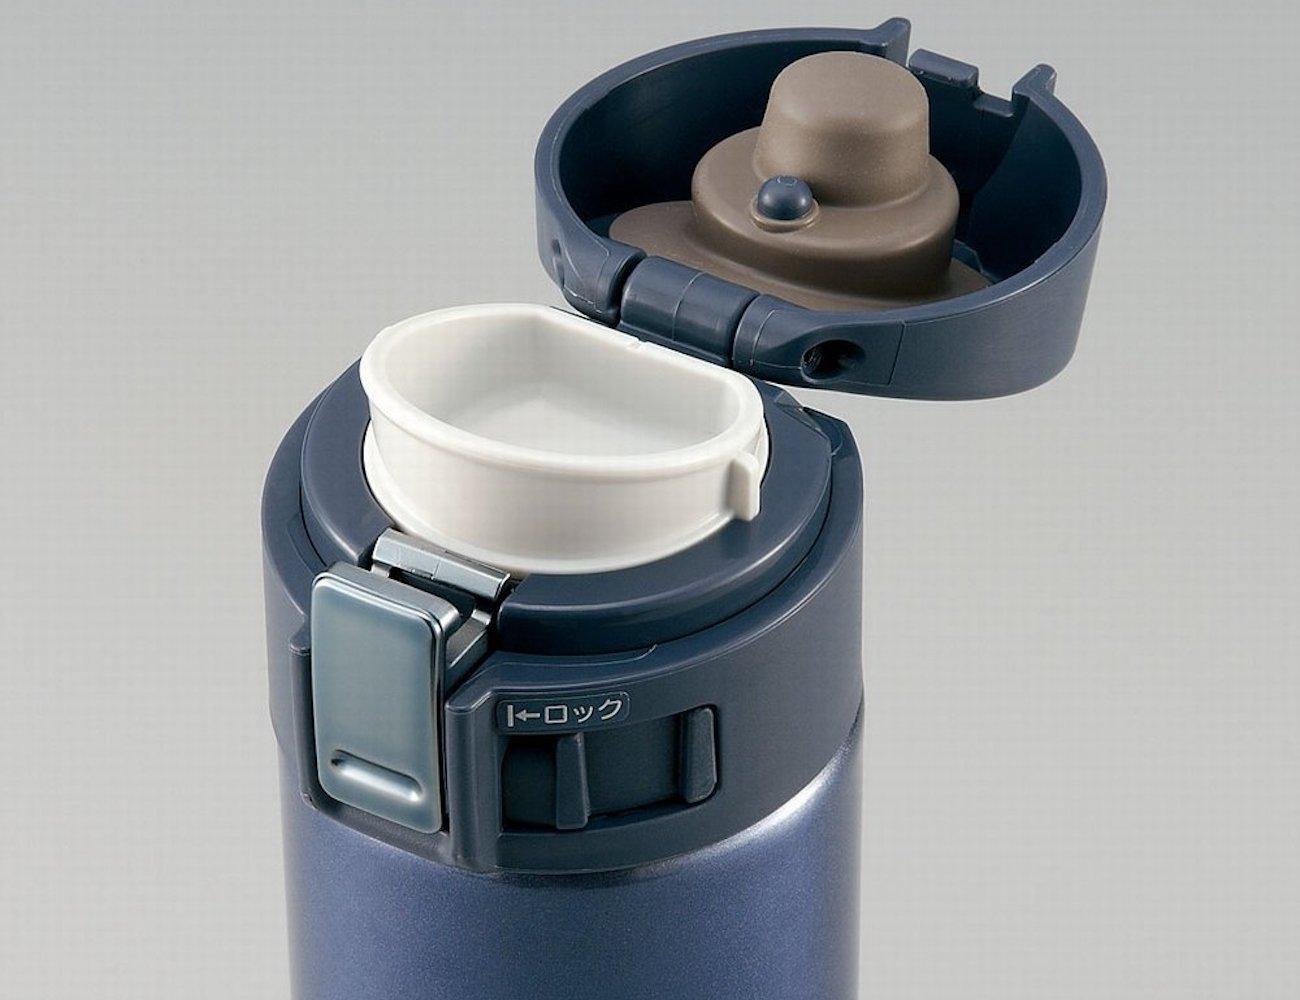 Zojirushi Stainless Steel Mug